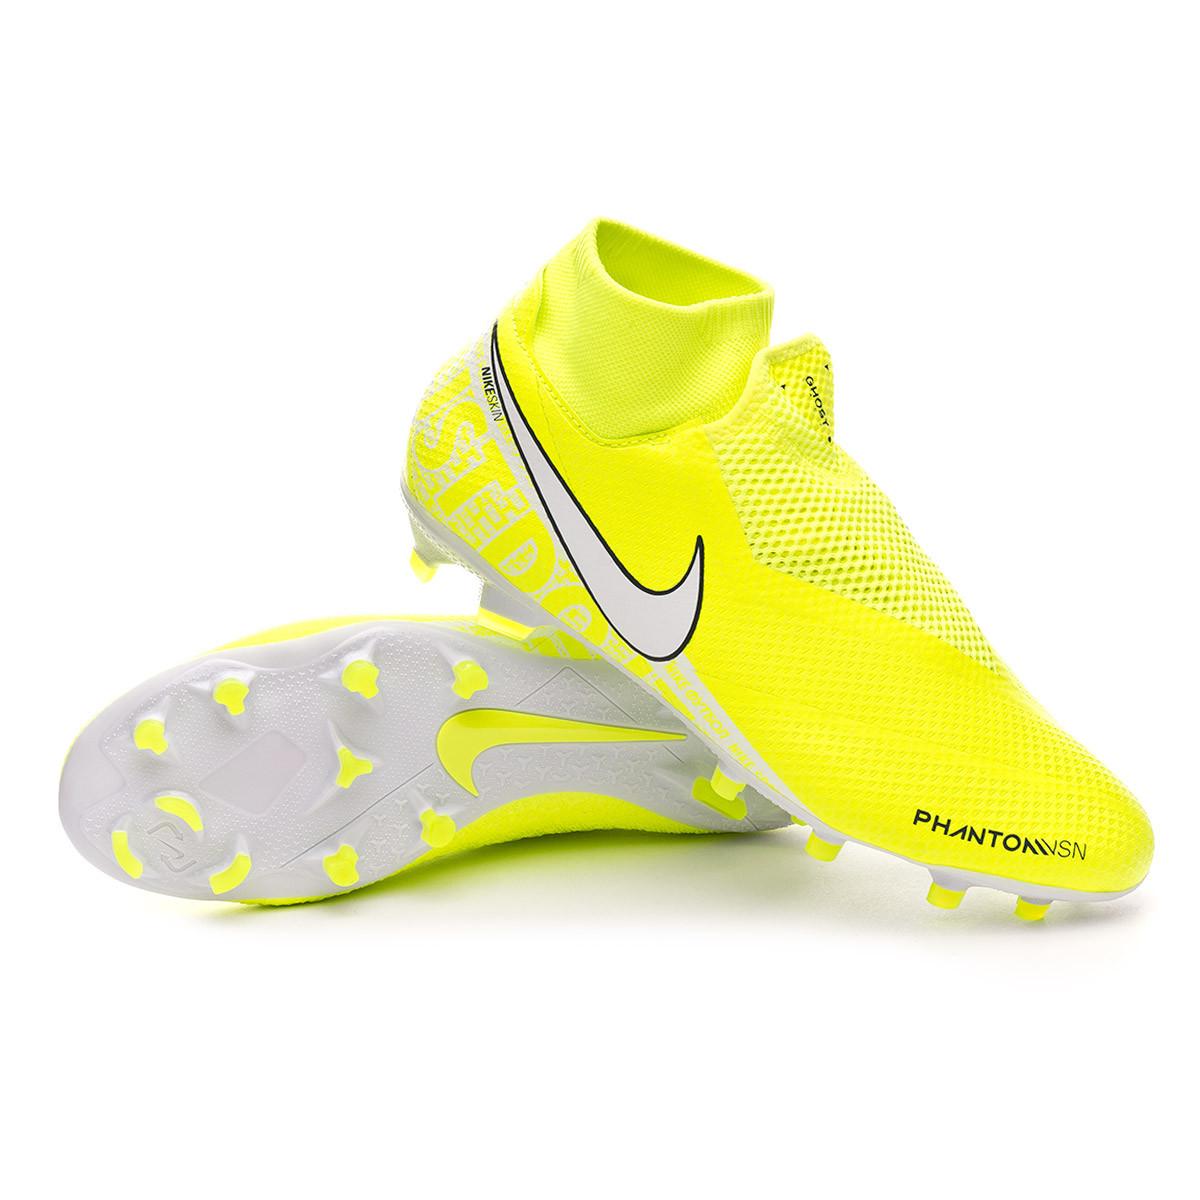 Chaussure de foot Nike Phantom Vision Pro DF FG Volt-White ...